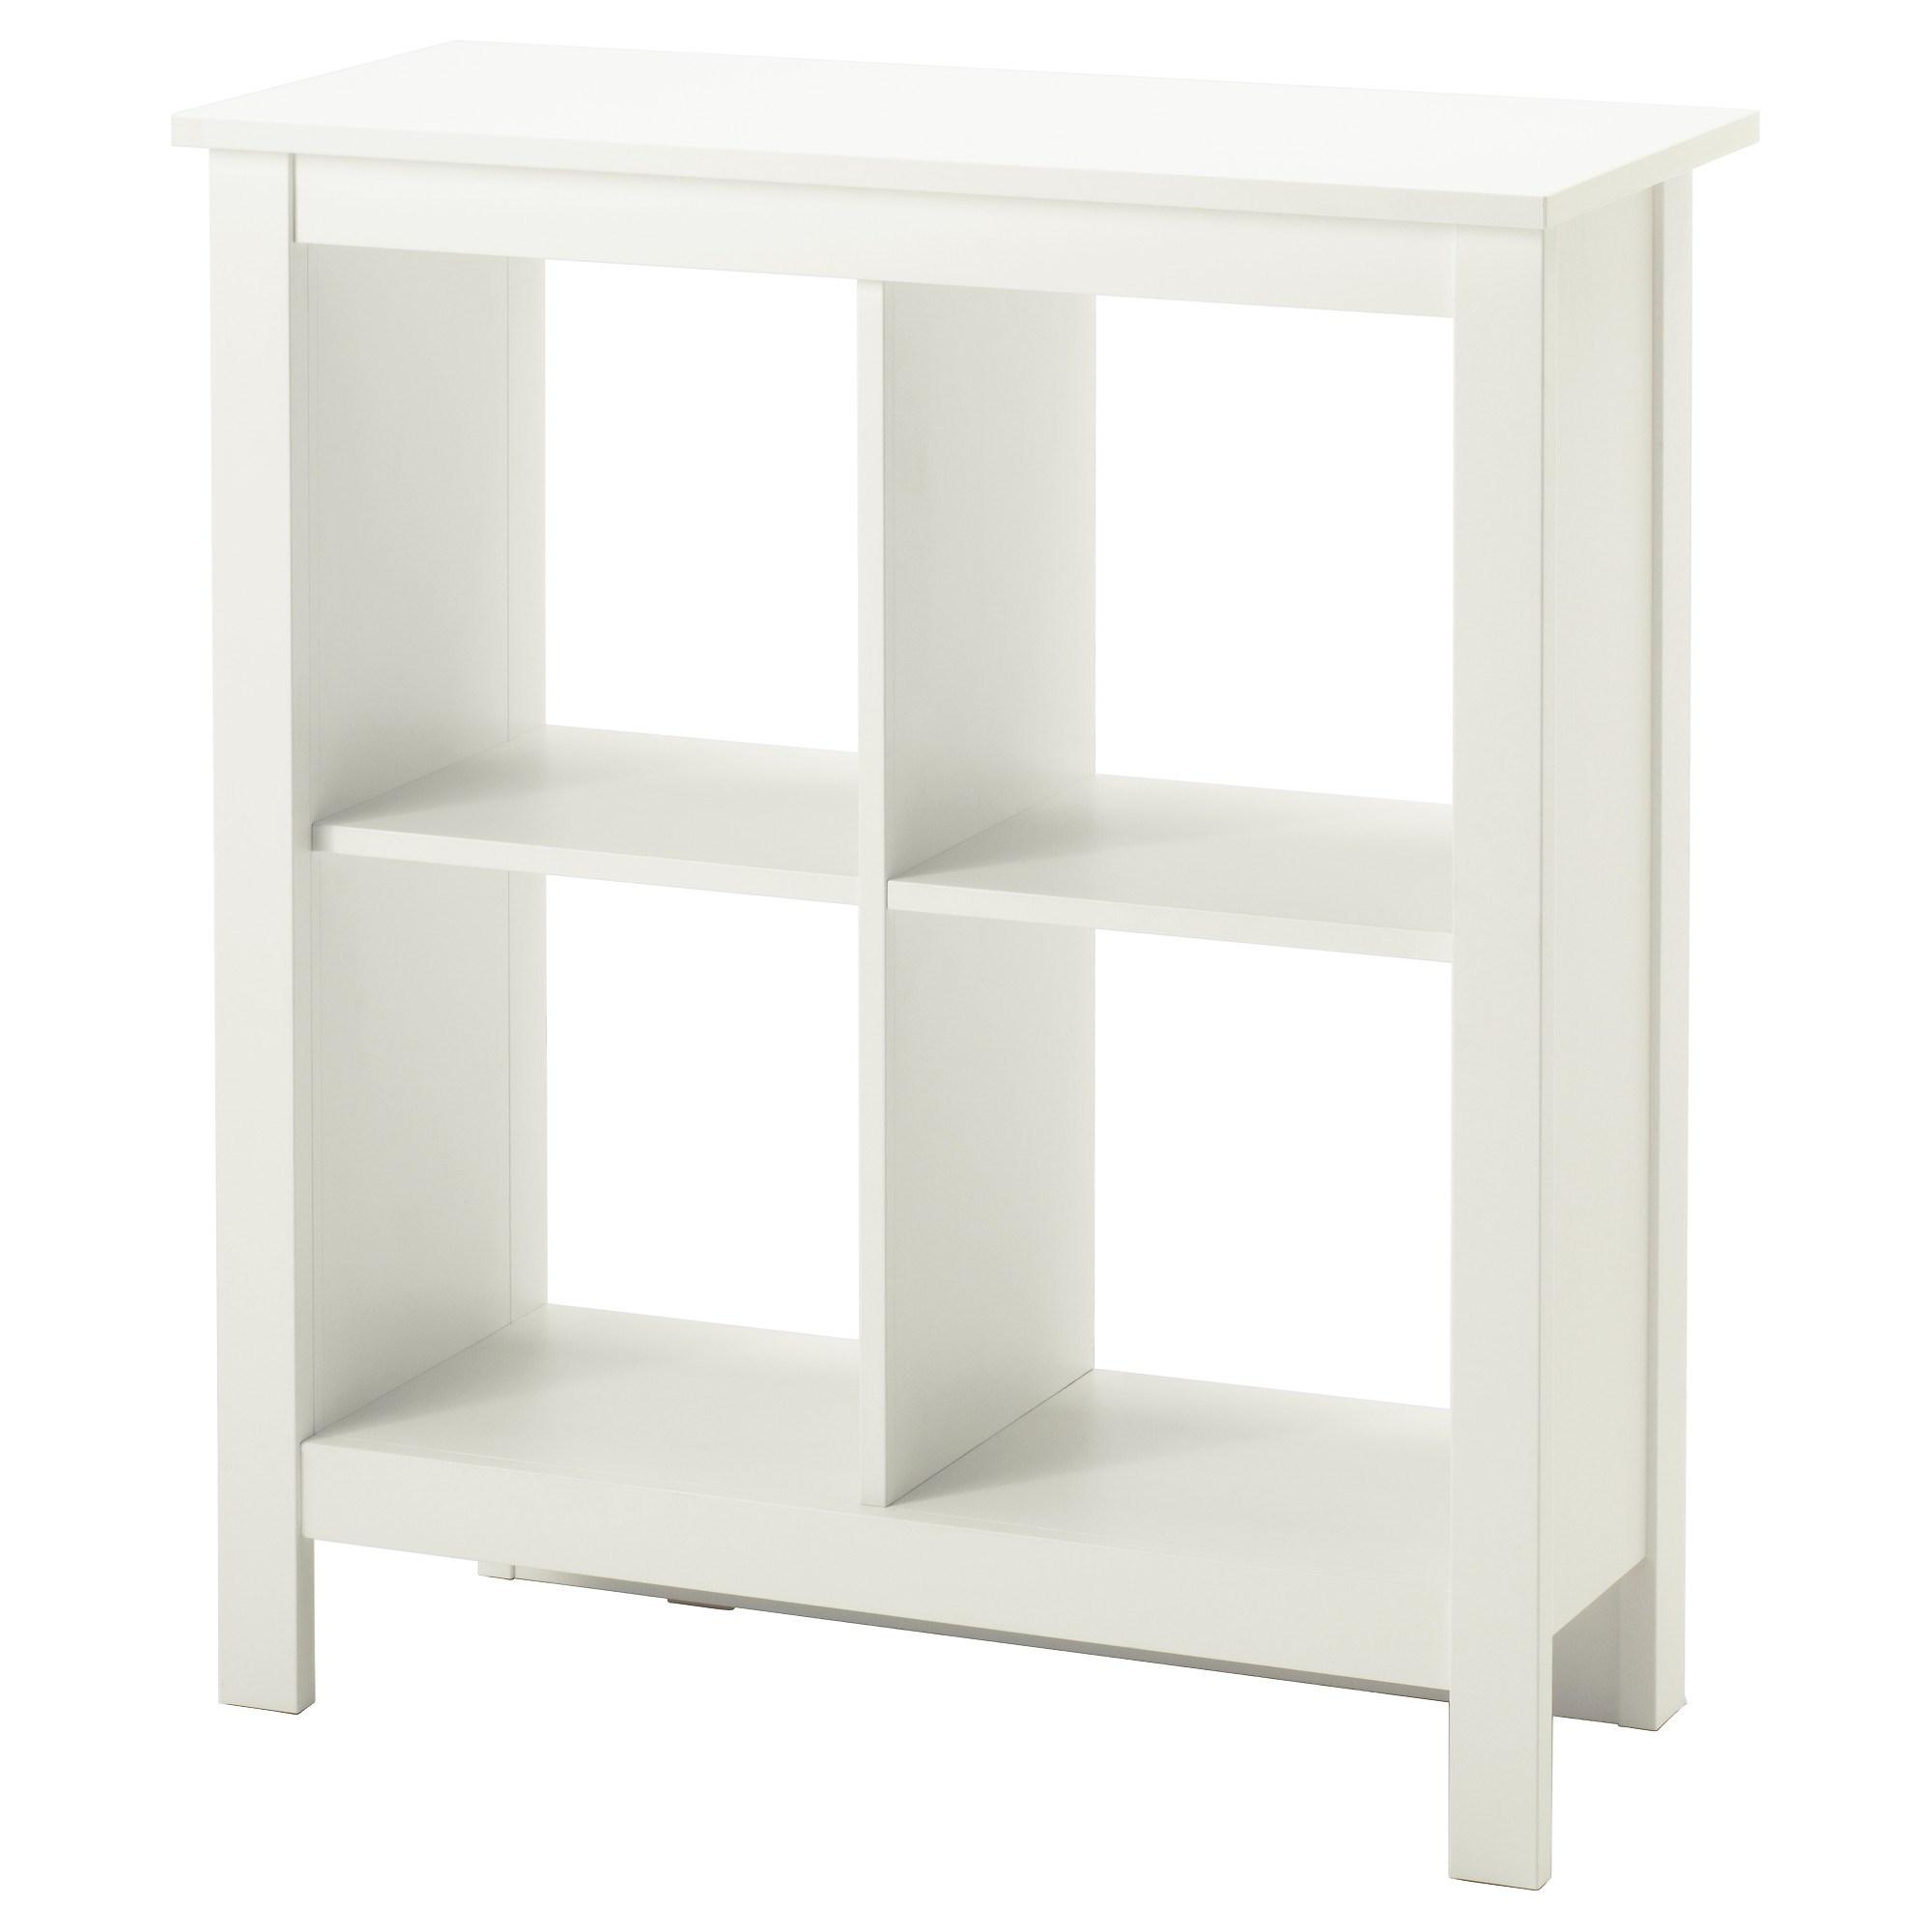 Regal ikea  TOMNAS shelving unit white 81x92 cm | IKEA Hallway